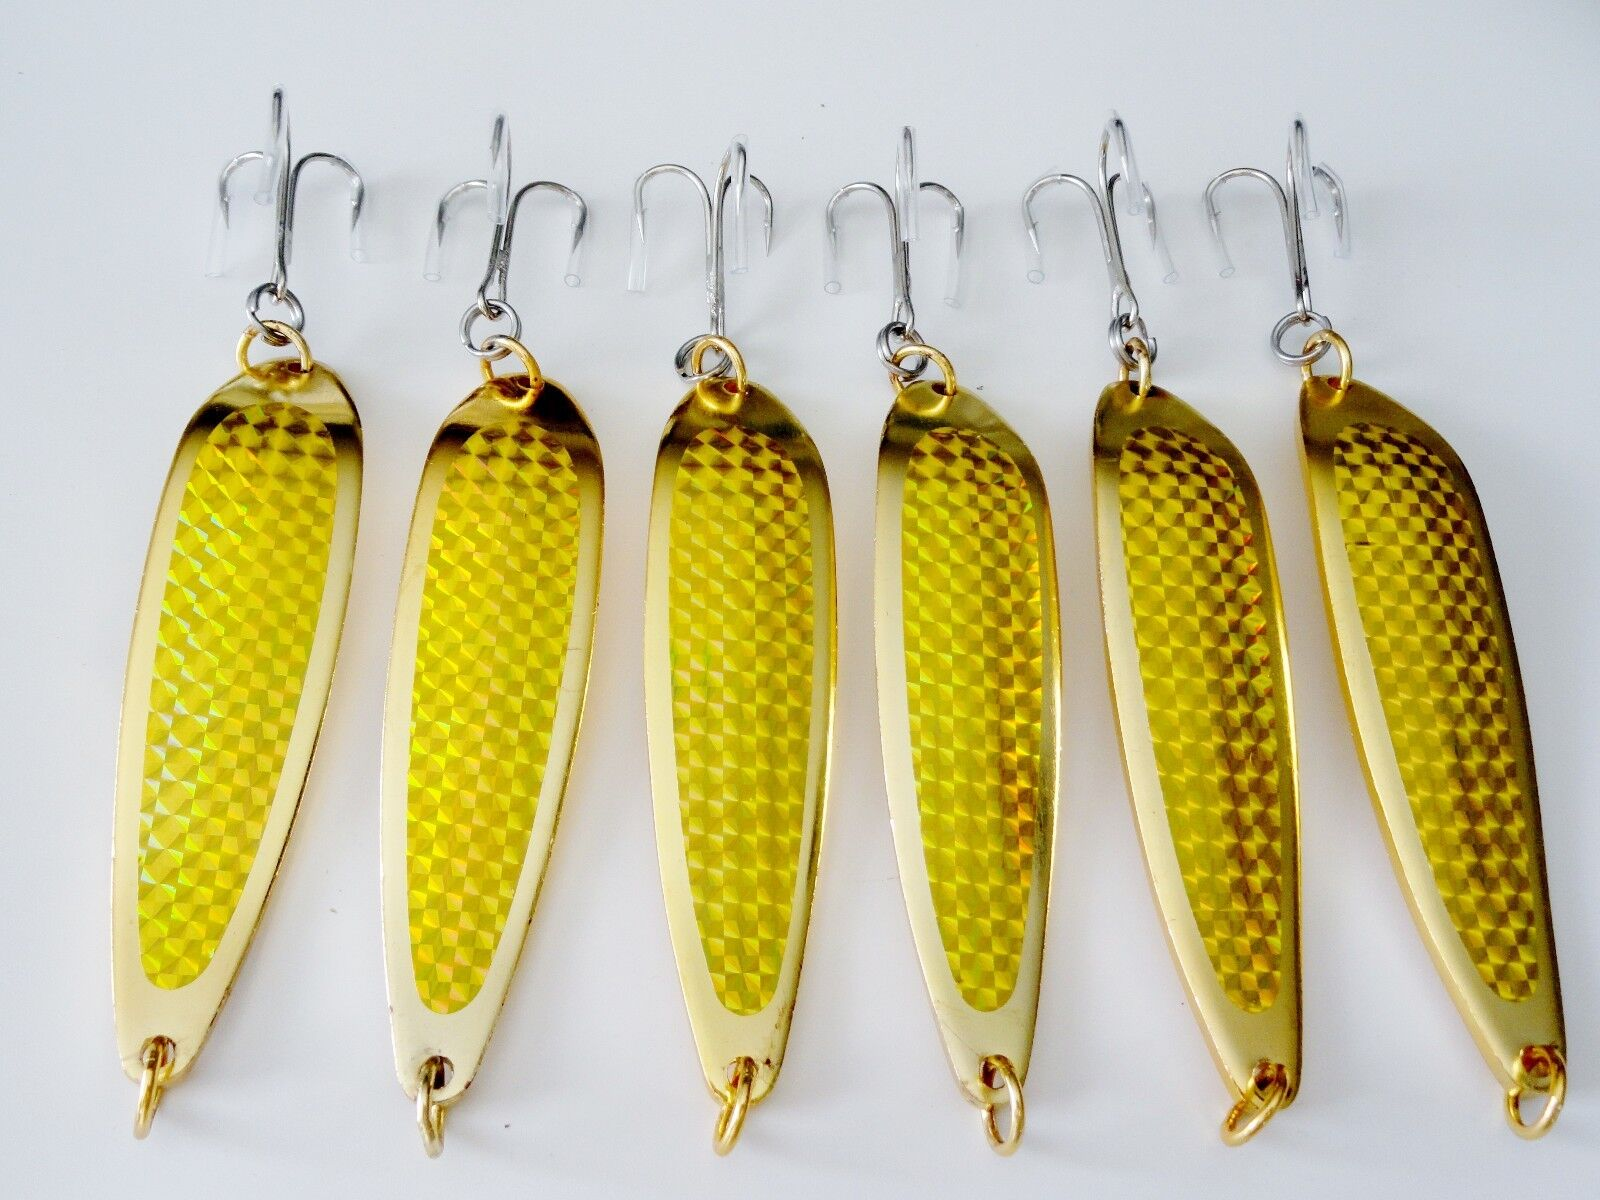 6 pcs Casting Casting Casting Spoons 1oz 2oz 3oz 5oz 7oz 9oz oro Krocodile Style Fishing Lures e667bc